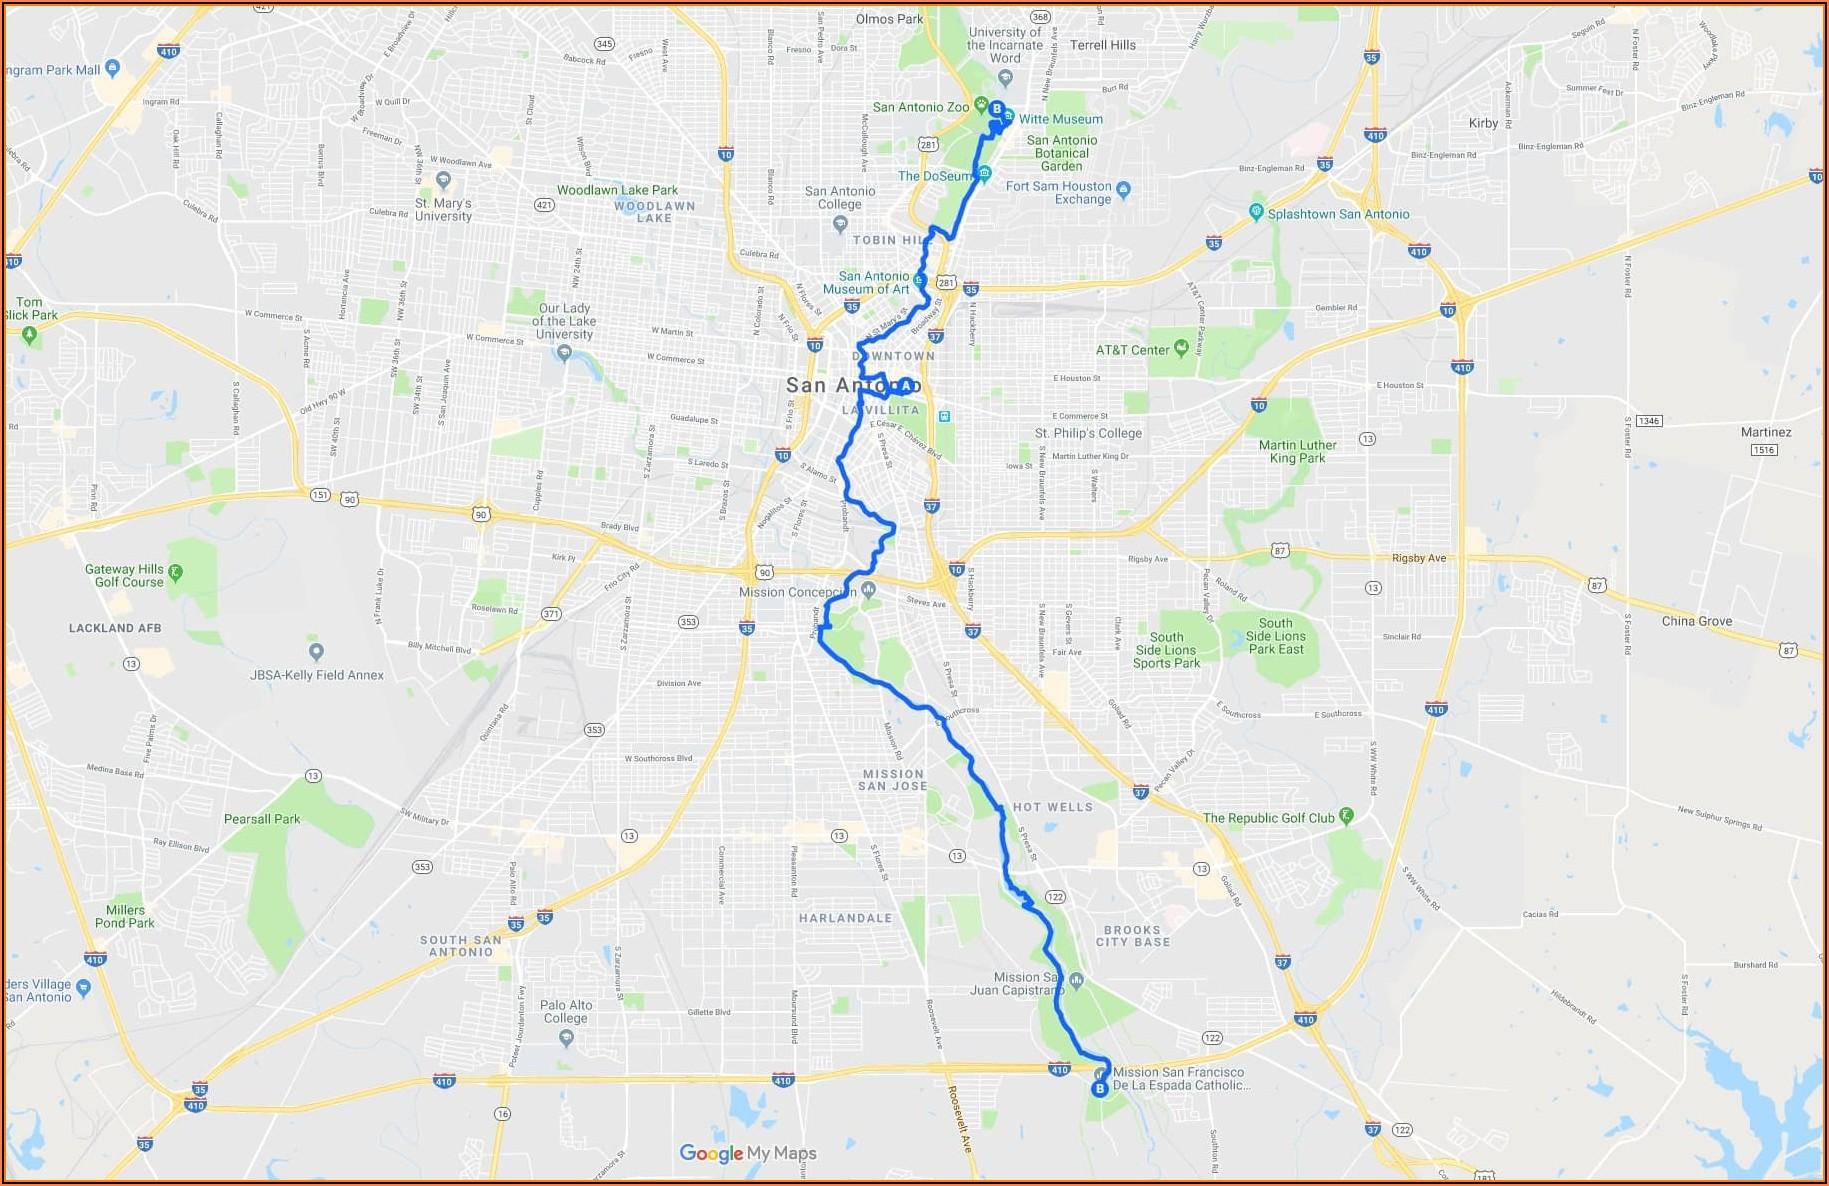 San Antonio Riverwalk Map Of Hotels And Restaurants